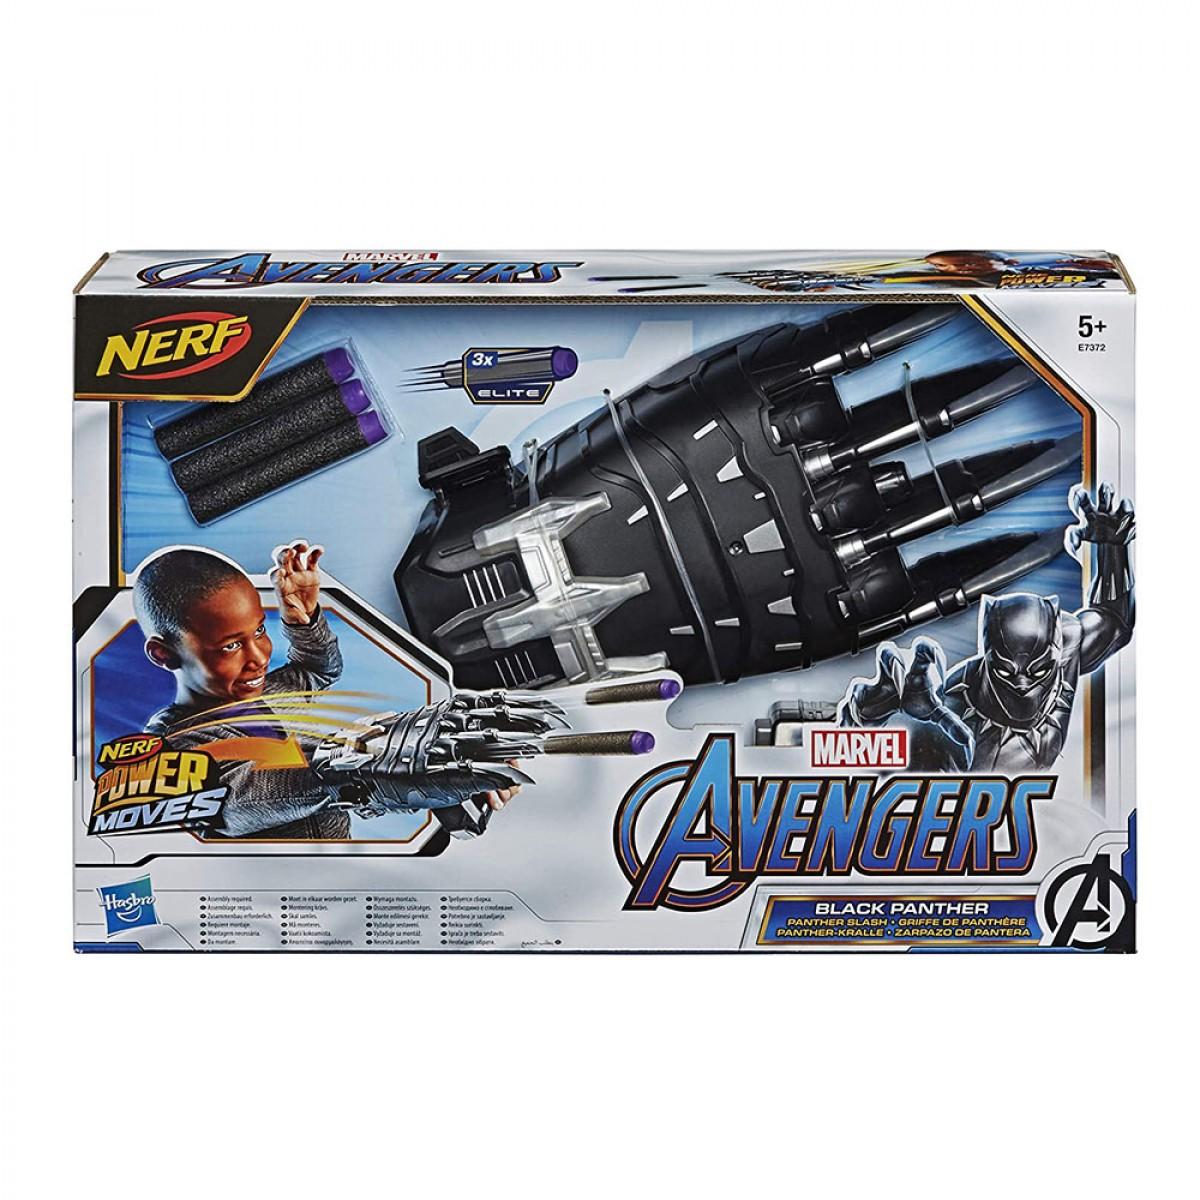 AVENGERS POWER MOVES ROLE PLAY E7372